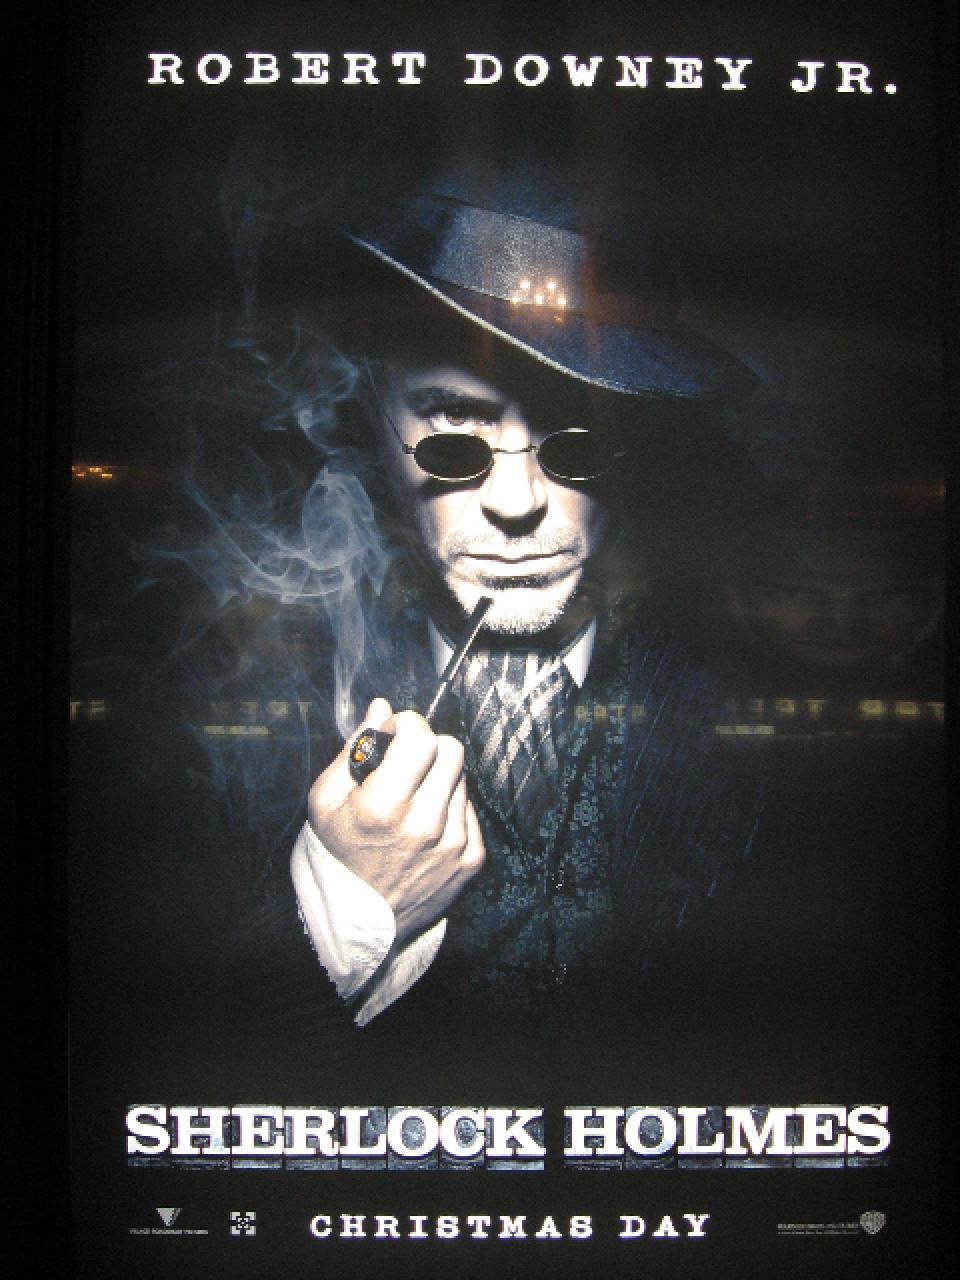 films à venir images 'Sherlock Holmes' Movie Poster HD fond